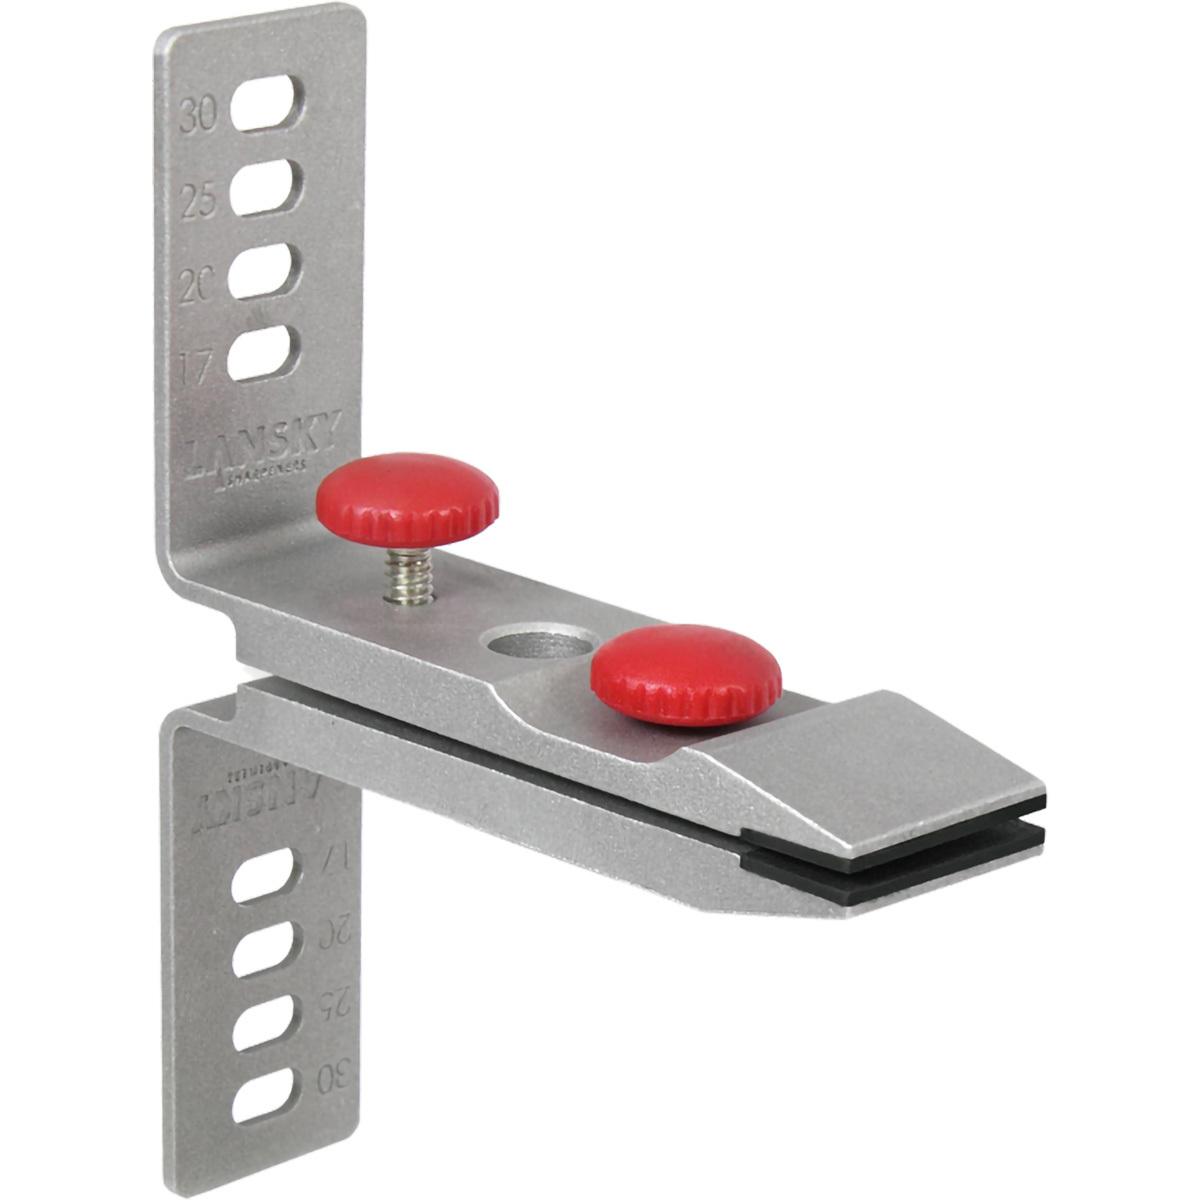 Lansky струбцина для заточки ножа RCLAMP